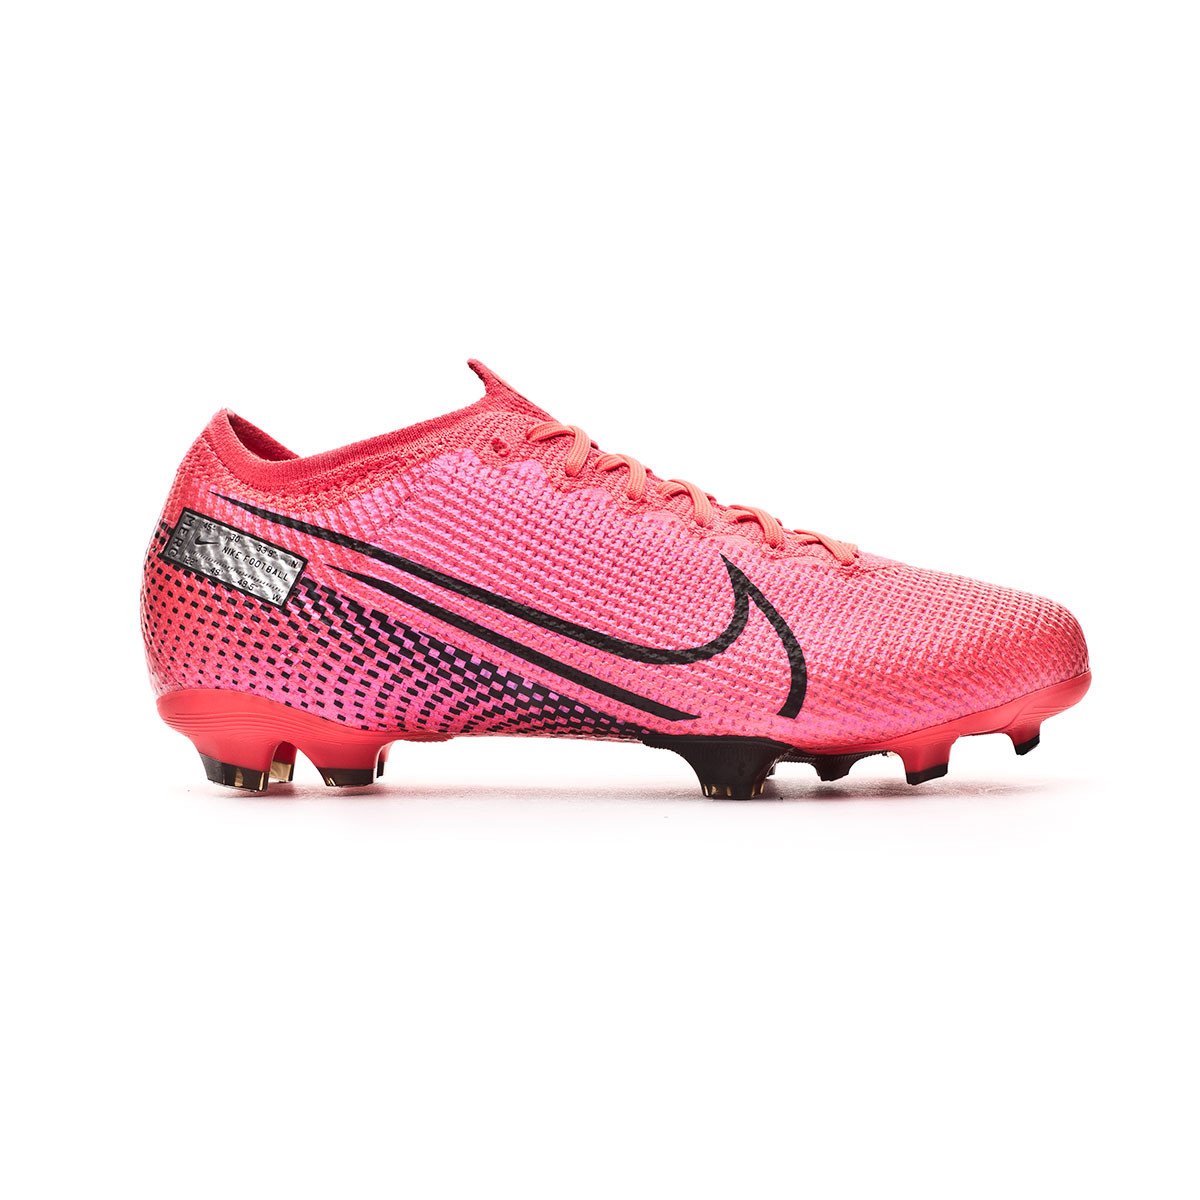 Explícito Sotavento Delegar  Bota de fútbol Nike Mercurial Vapor XIII Elite FG Niño Laser crimson-Black  - Tienda de fútbol Fútbol Emotion